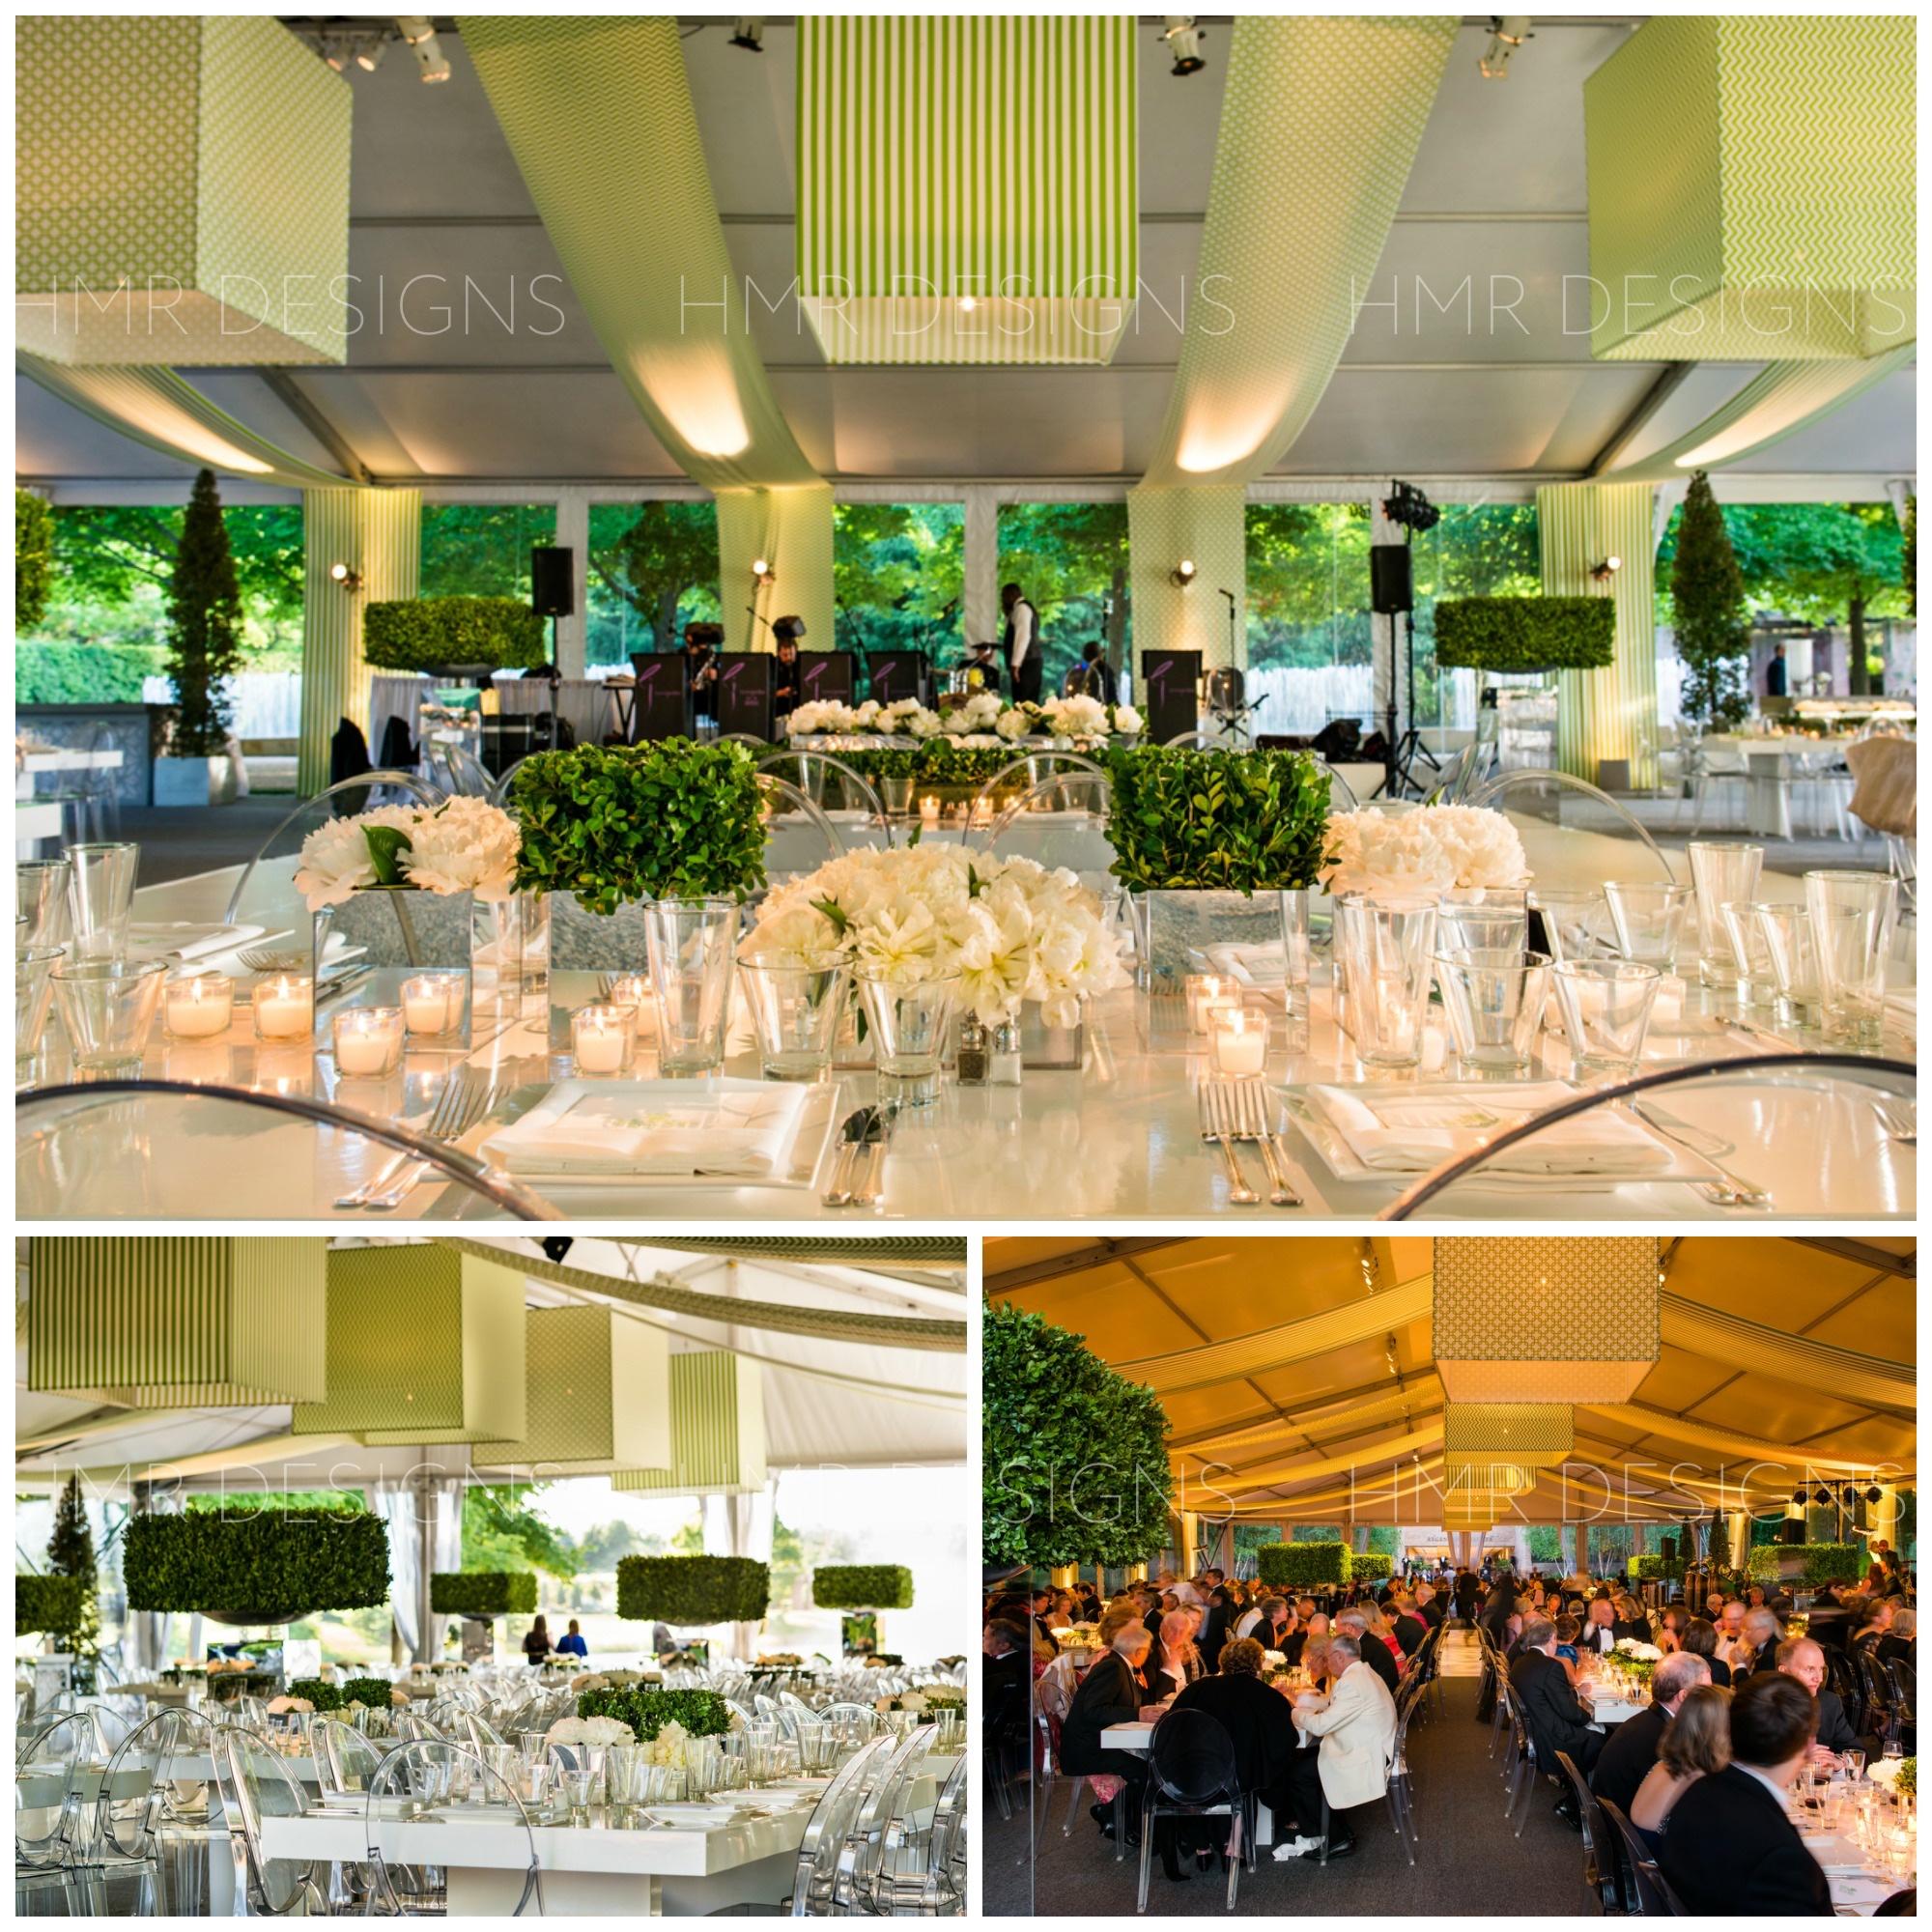 Lush gala decor by HMR Designs